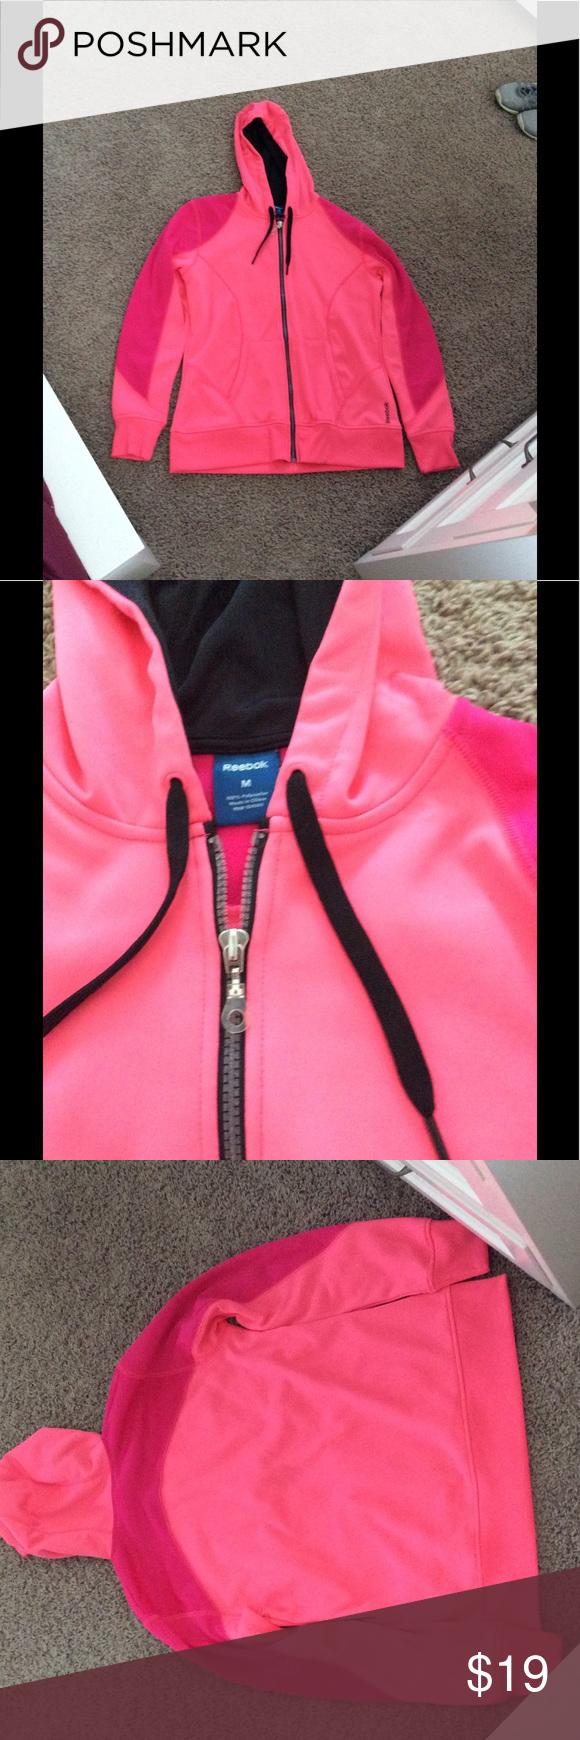 Hot Pink Athletic Jacket Nwot Athletic Reebok Jacket Hot Pink And Magenta Colors 2 Pockets Drawstring Hood New Witho Athletic Jacket Clothes Design Jackets [ 1740 x 580 Pixel ]